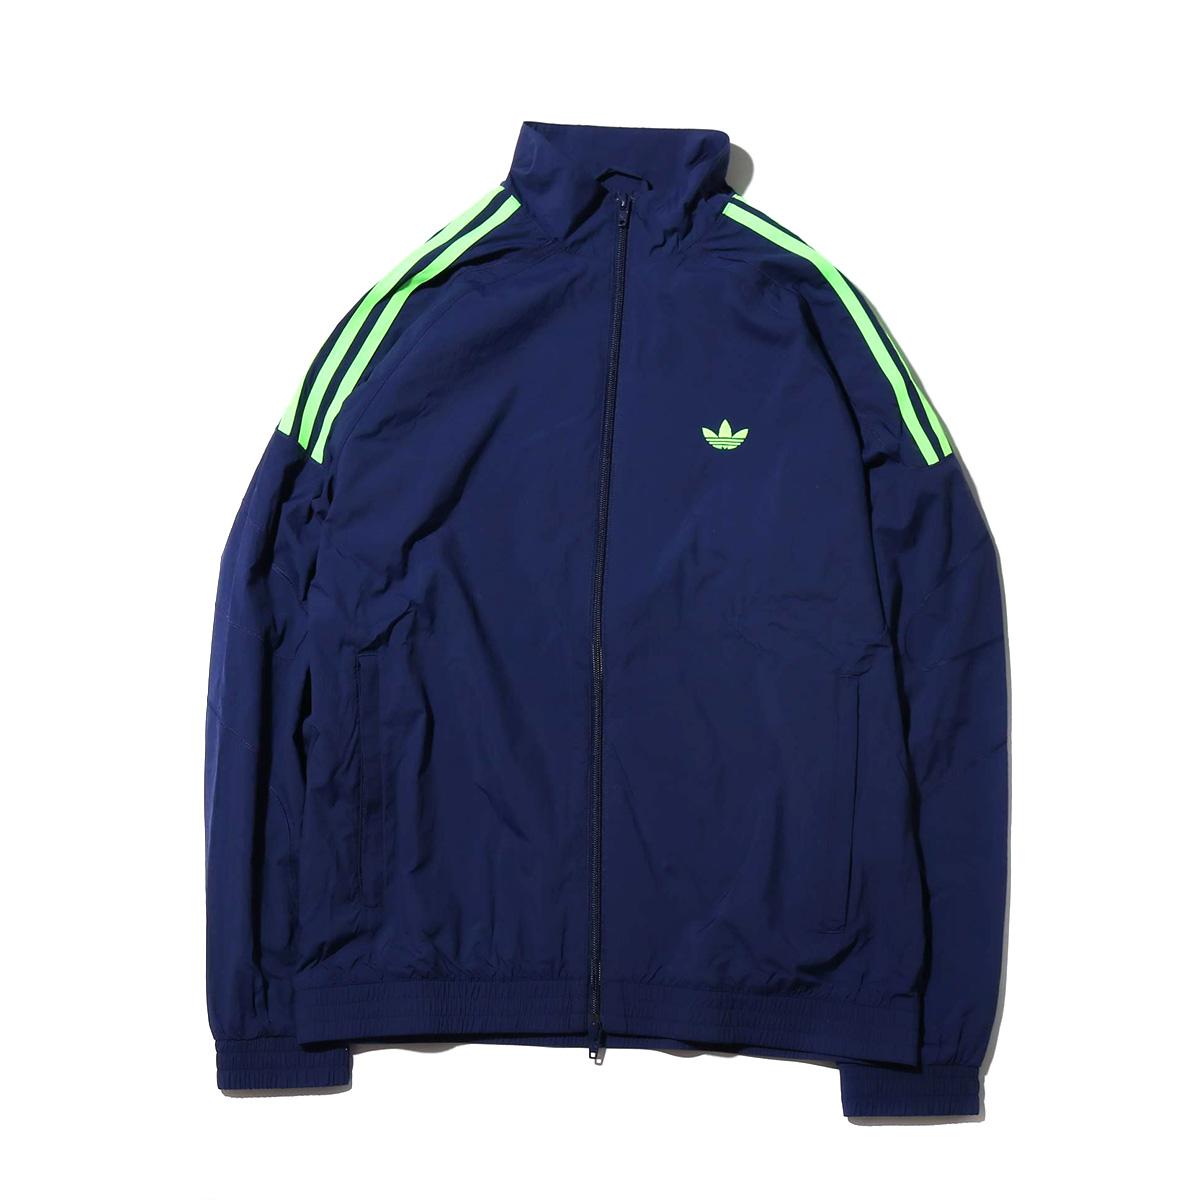 adidas Originals FLAMESTRIKE WOVEN TRACK TOP (アディダスオリジナルス フレームストライク ウーブン トラックトップ)DARK BLUE【メンズ ジャケット】19SS-I